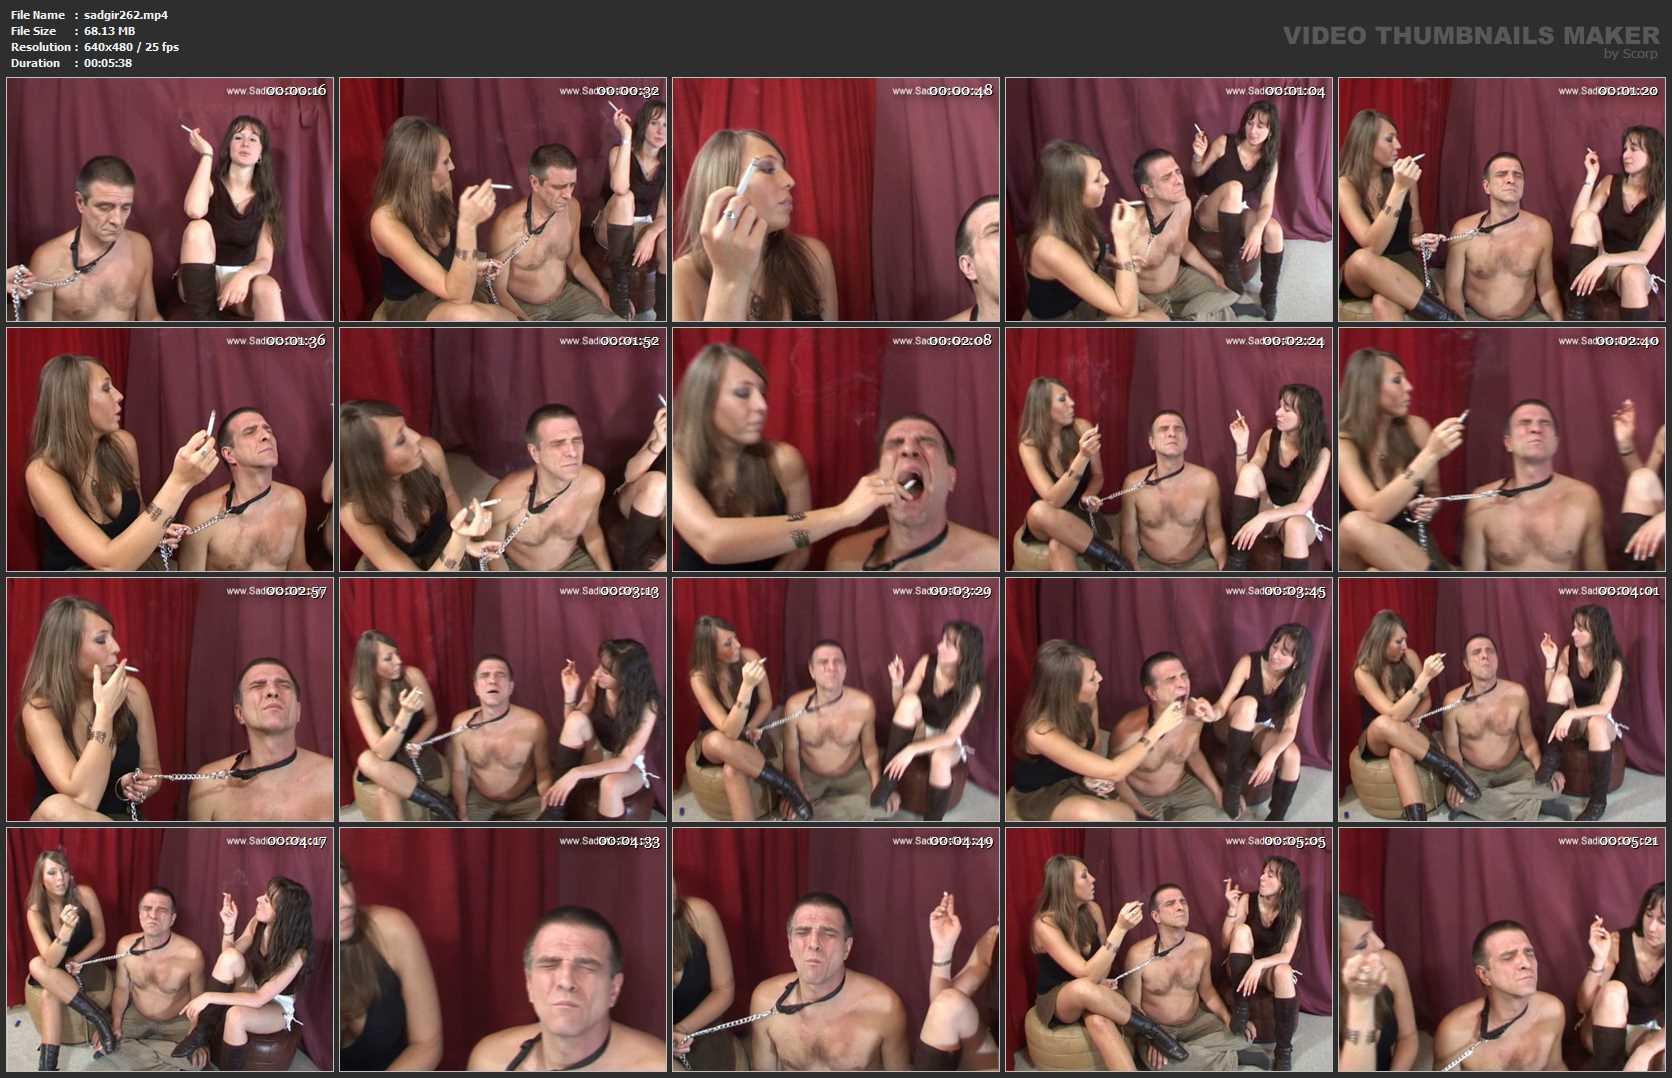 Vanessa and Nicole Humiliating 1 - SADISTIC-GIRLS - SD/480p/MP4